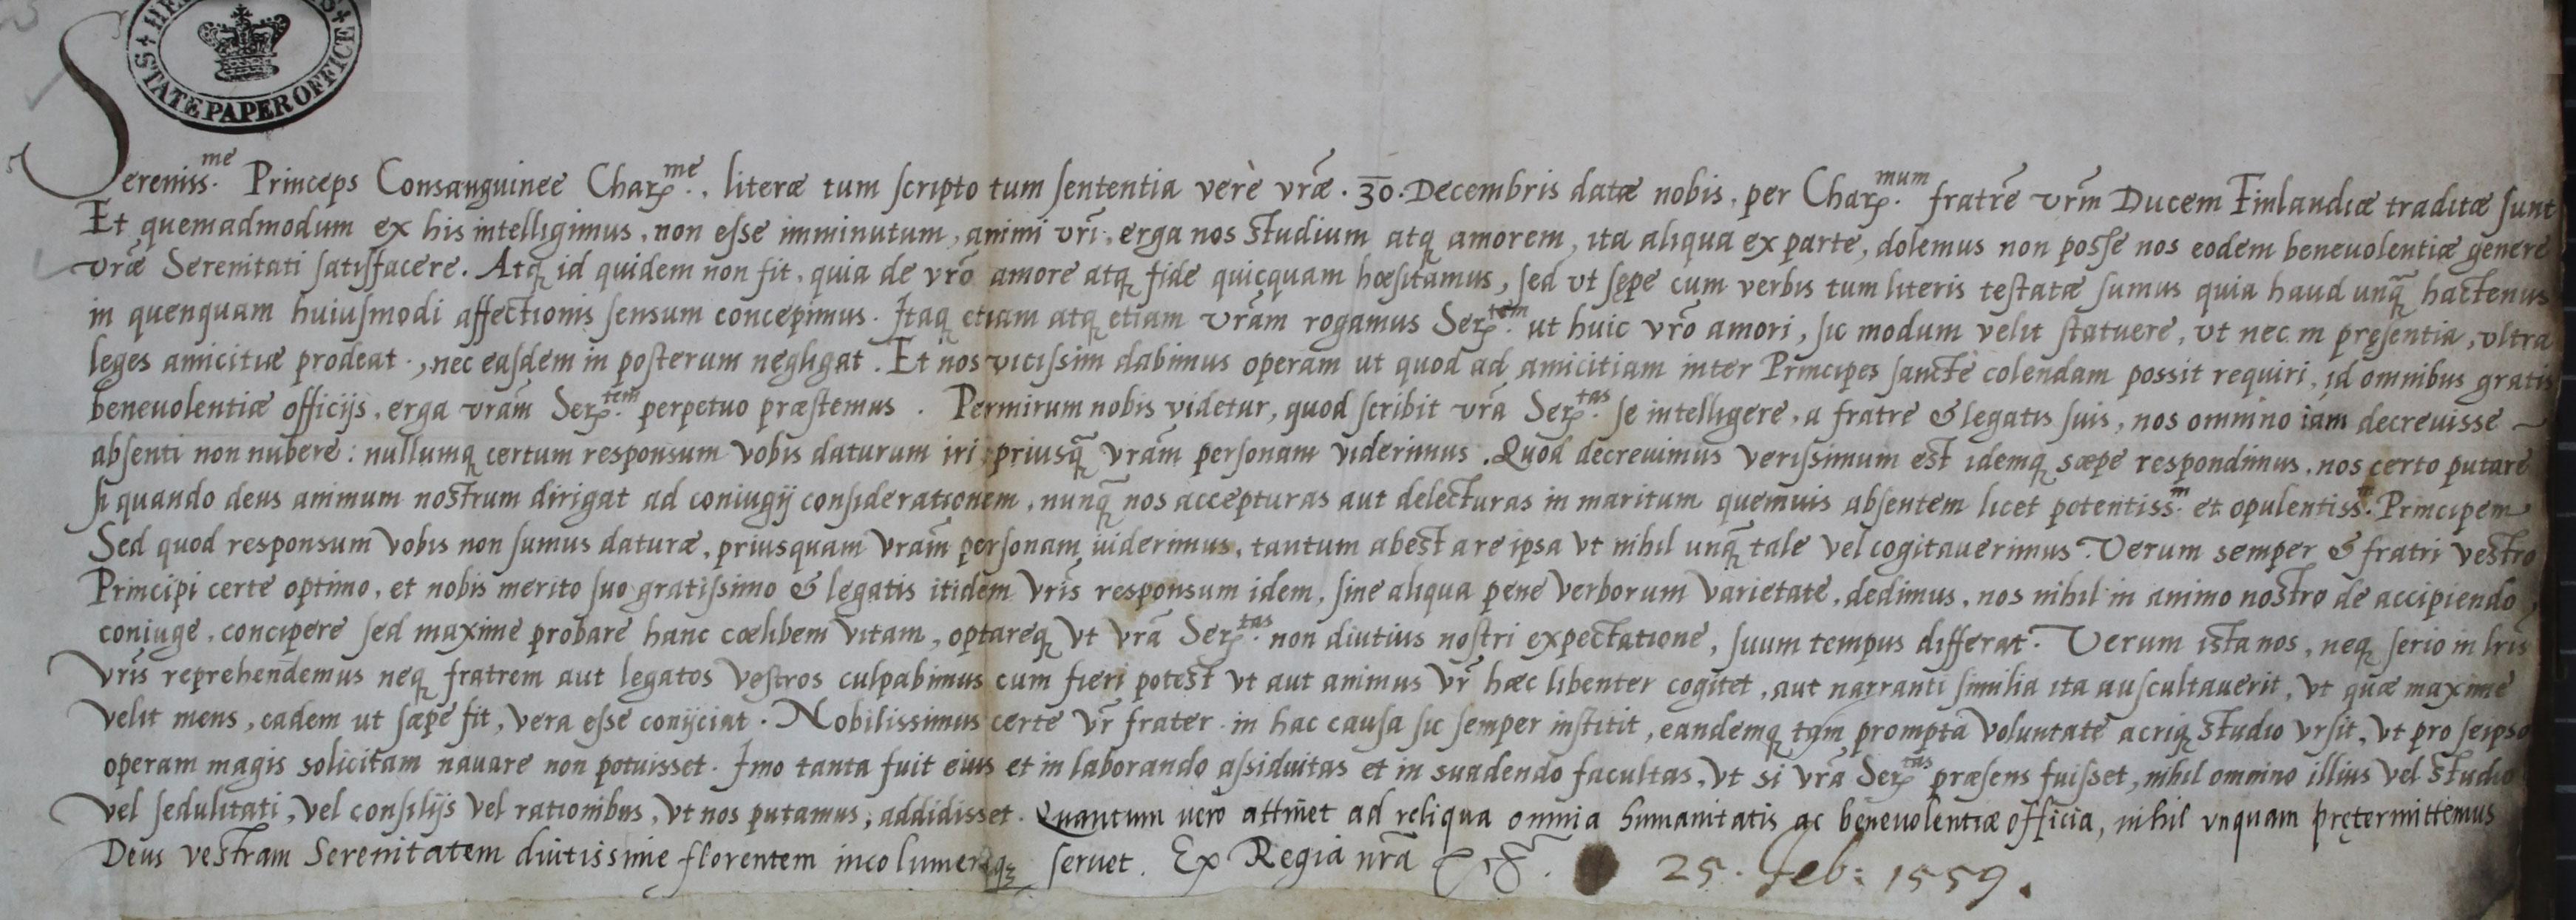 Elizabeth I to King Eric XIV of Sweden, 25 February 1560 (SP 70/11 f.74)